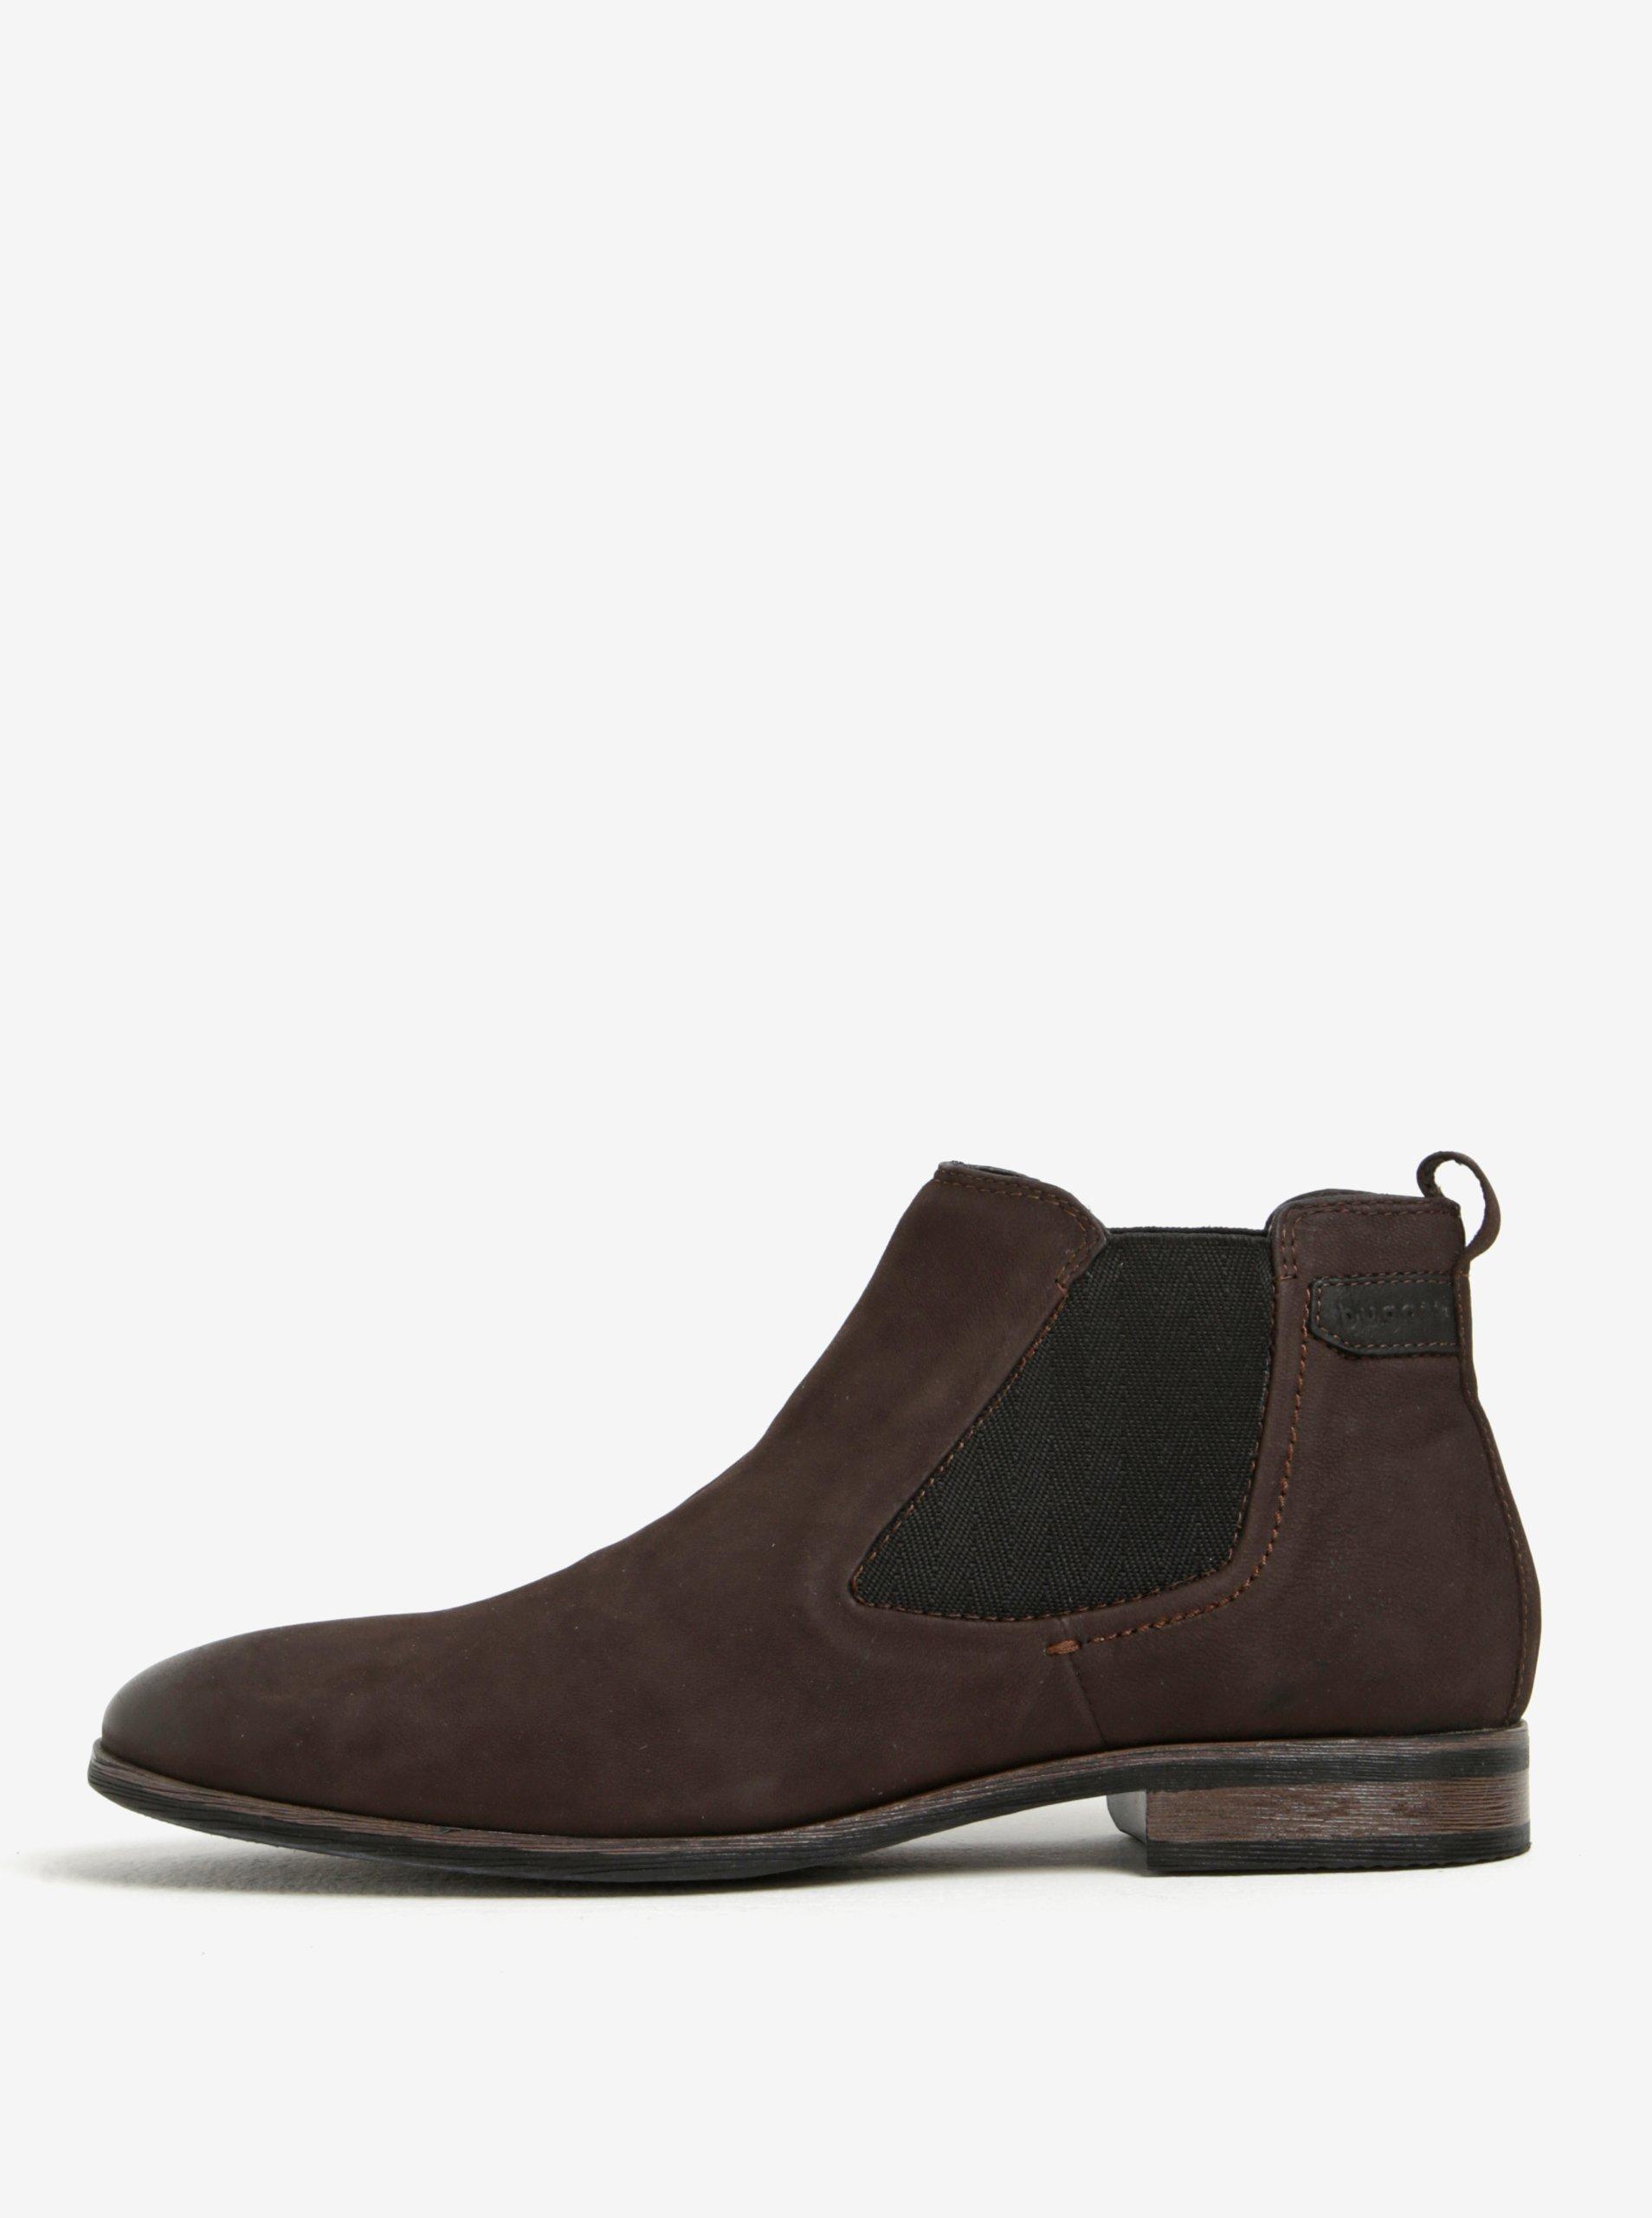 Tmavě hnědé pánské kožené chelsea boty bugatti Lothario